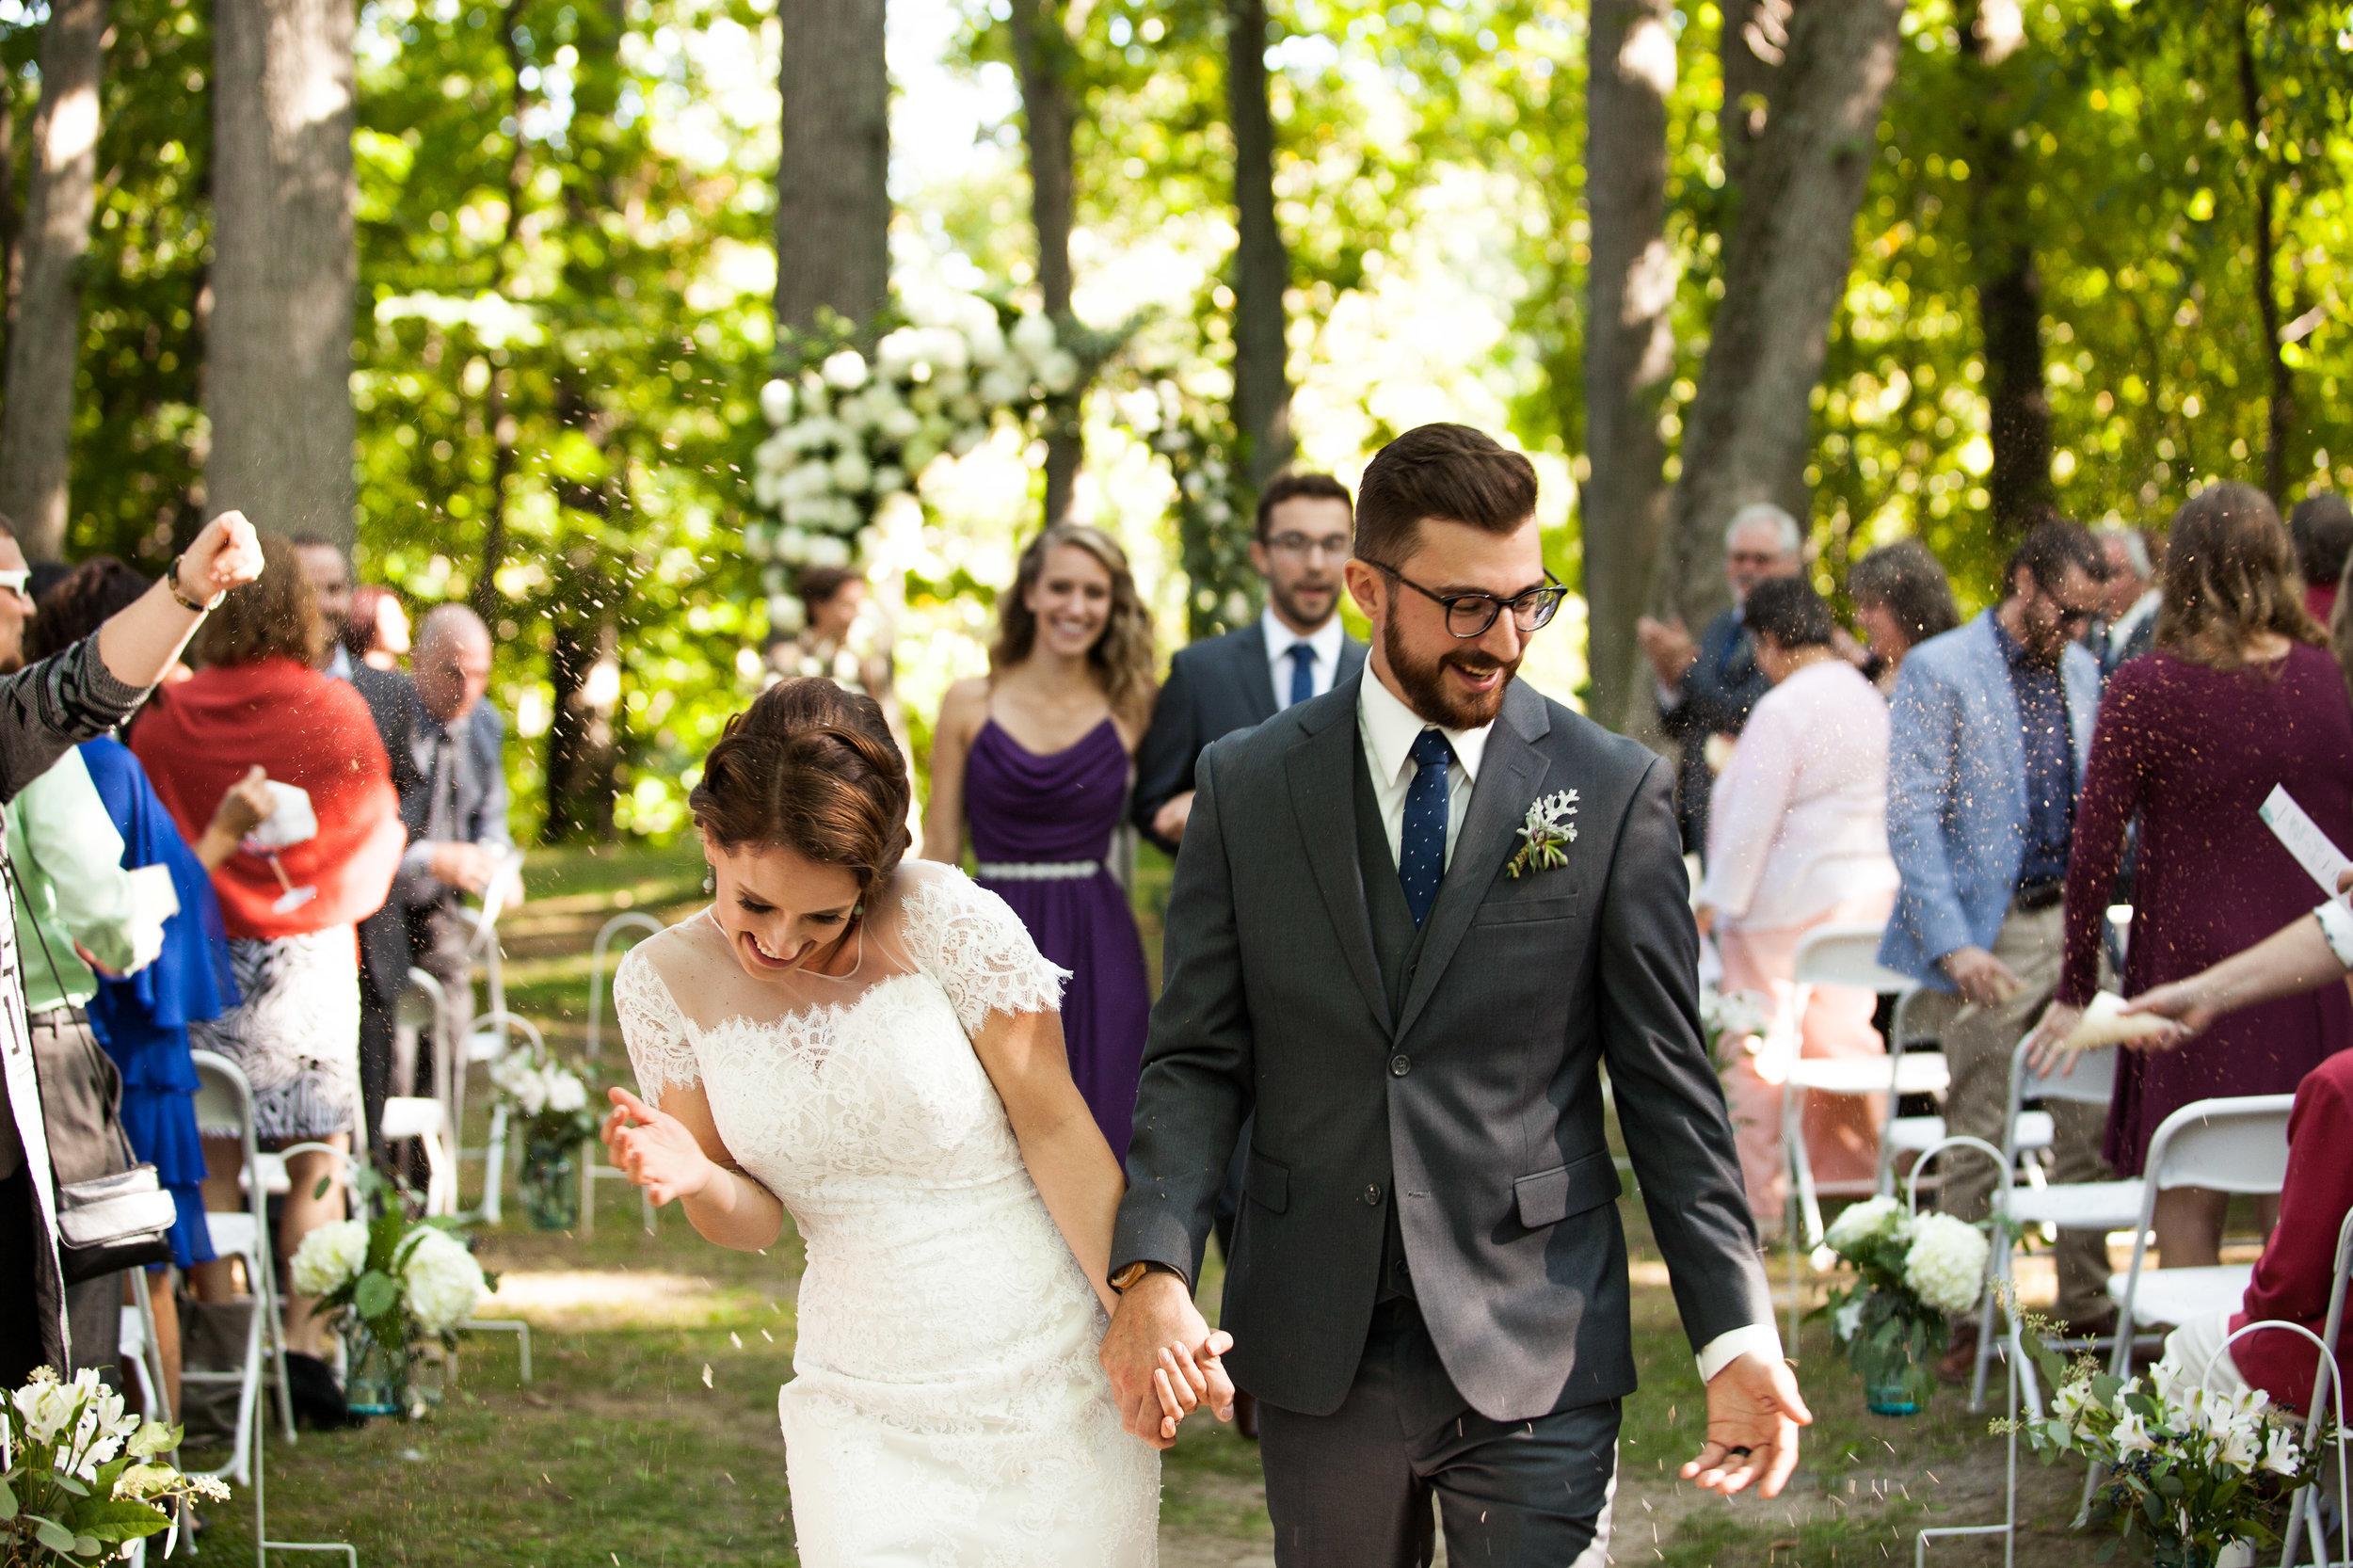 grand_rapids_wedding_rockford_wedding_richard_app_gallery_wedding_grand_rapids_wedding_photographer_summer_wedding_wabasis_lake_park_wedding_rustic_wedding-48.jpg